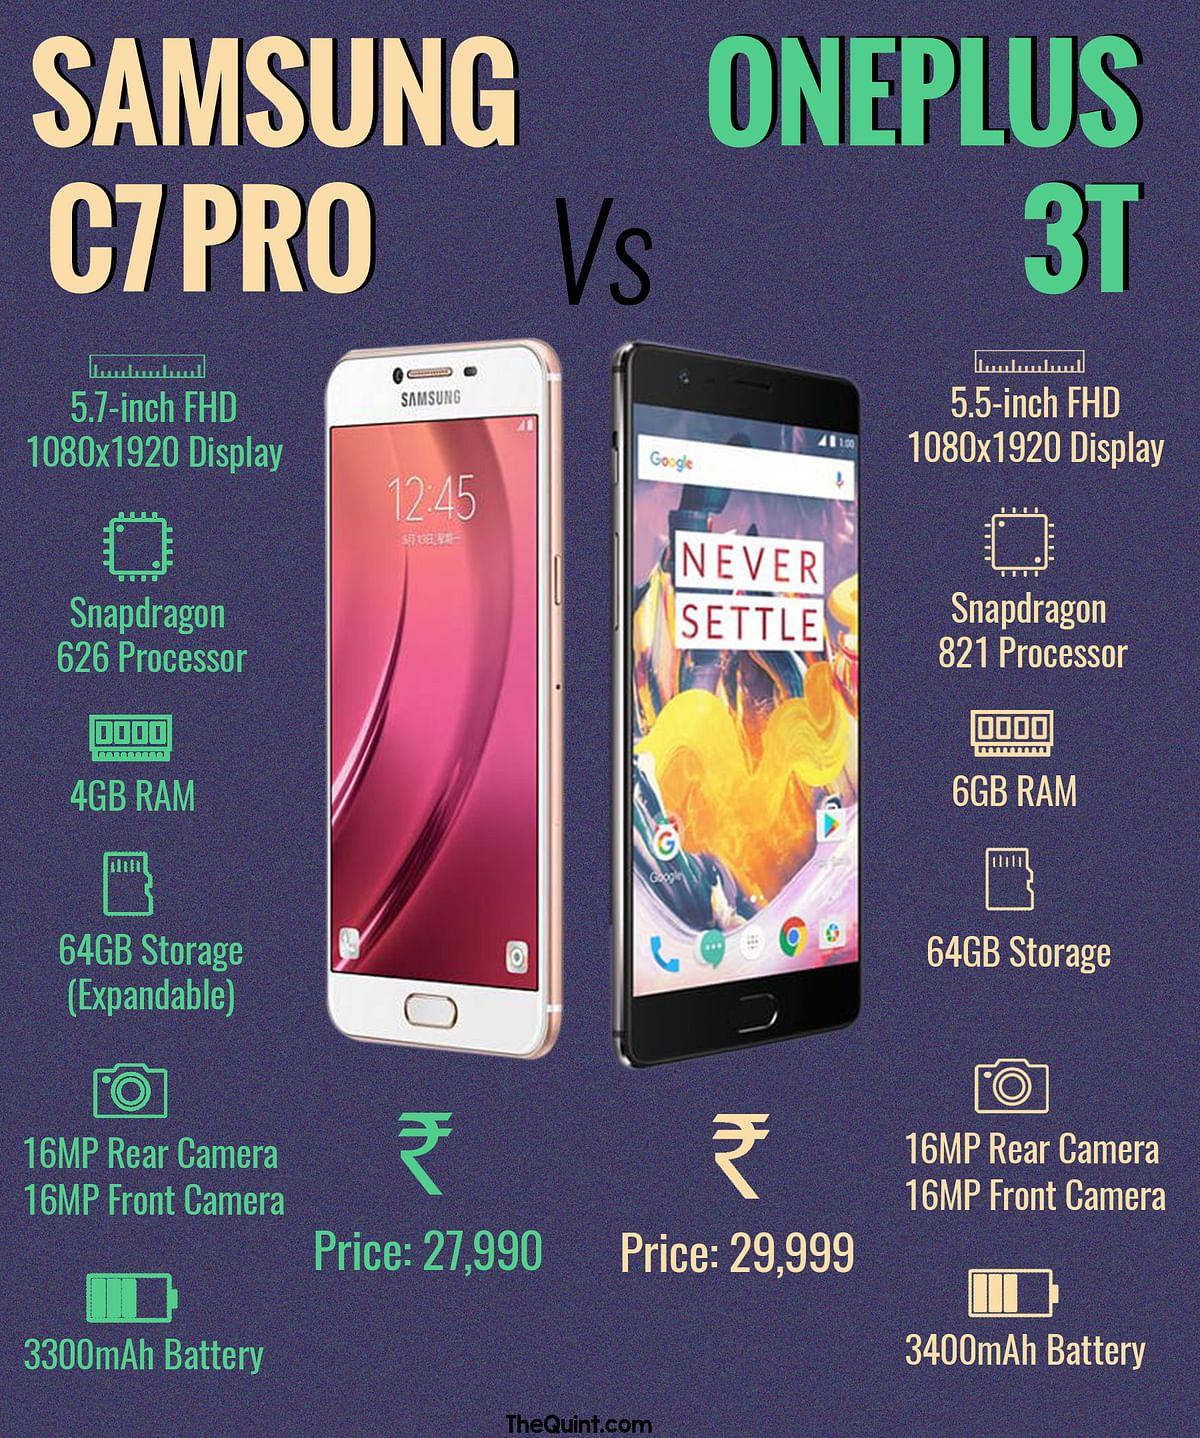 OnePlus 3T vs Samsung C7 Pro: The Under 30k Battle – Who Wins?